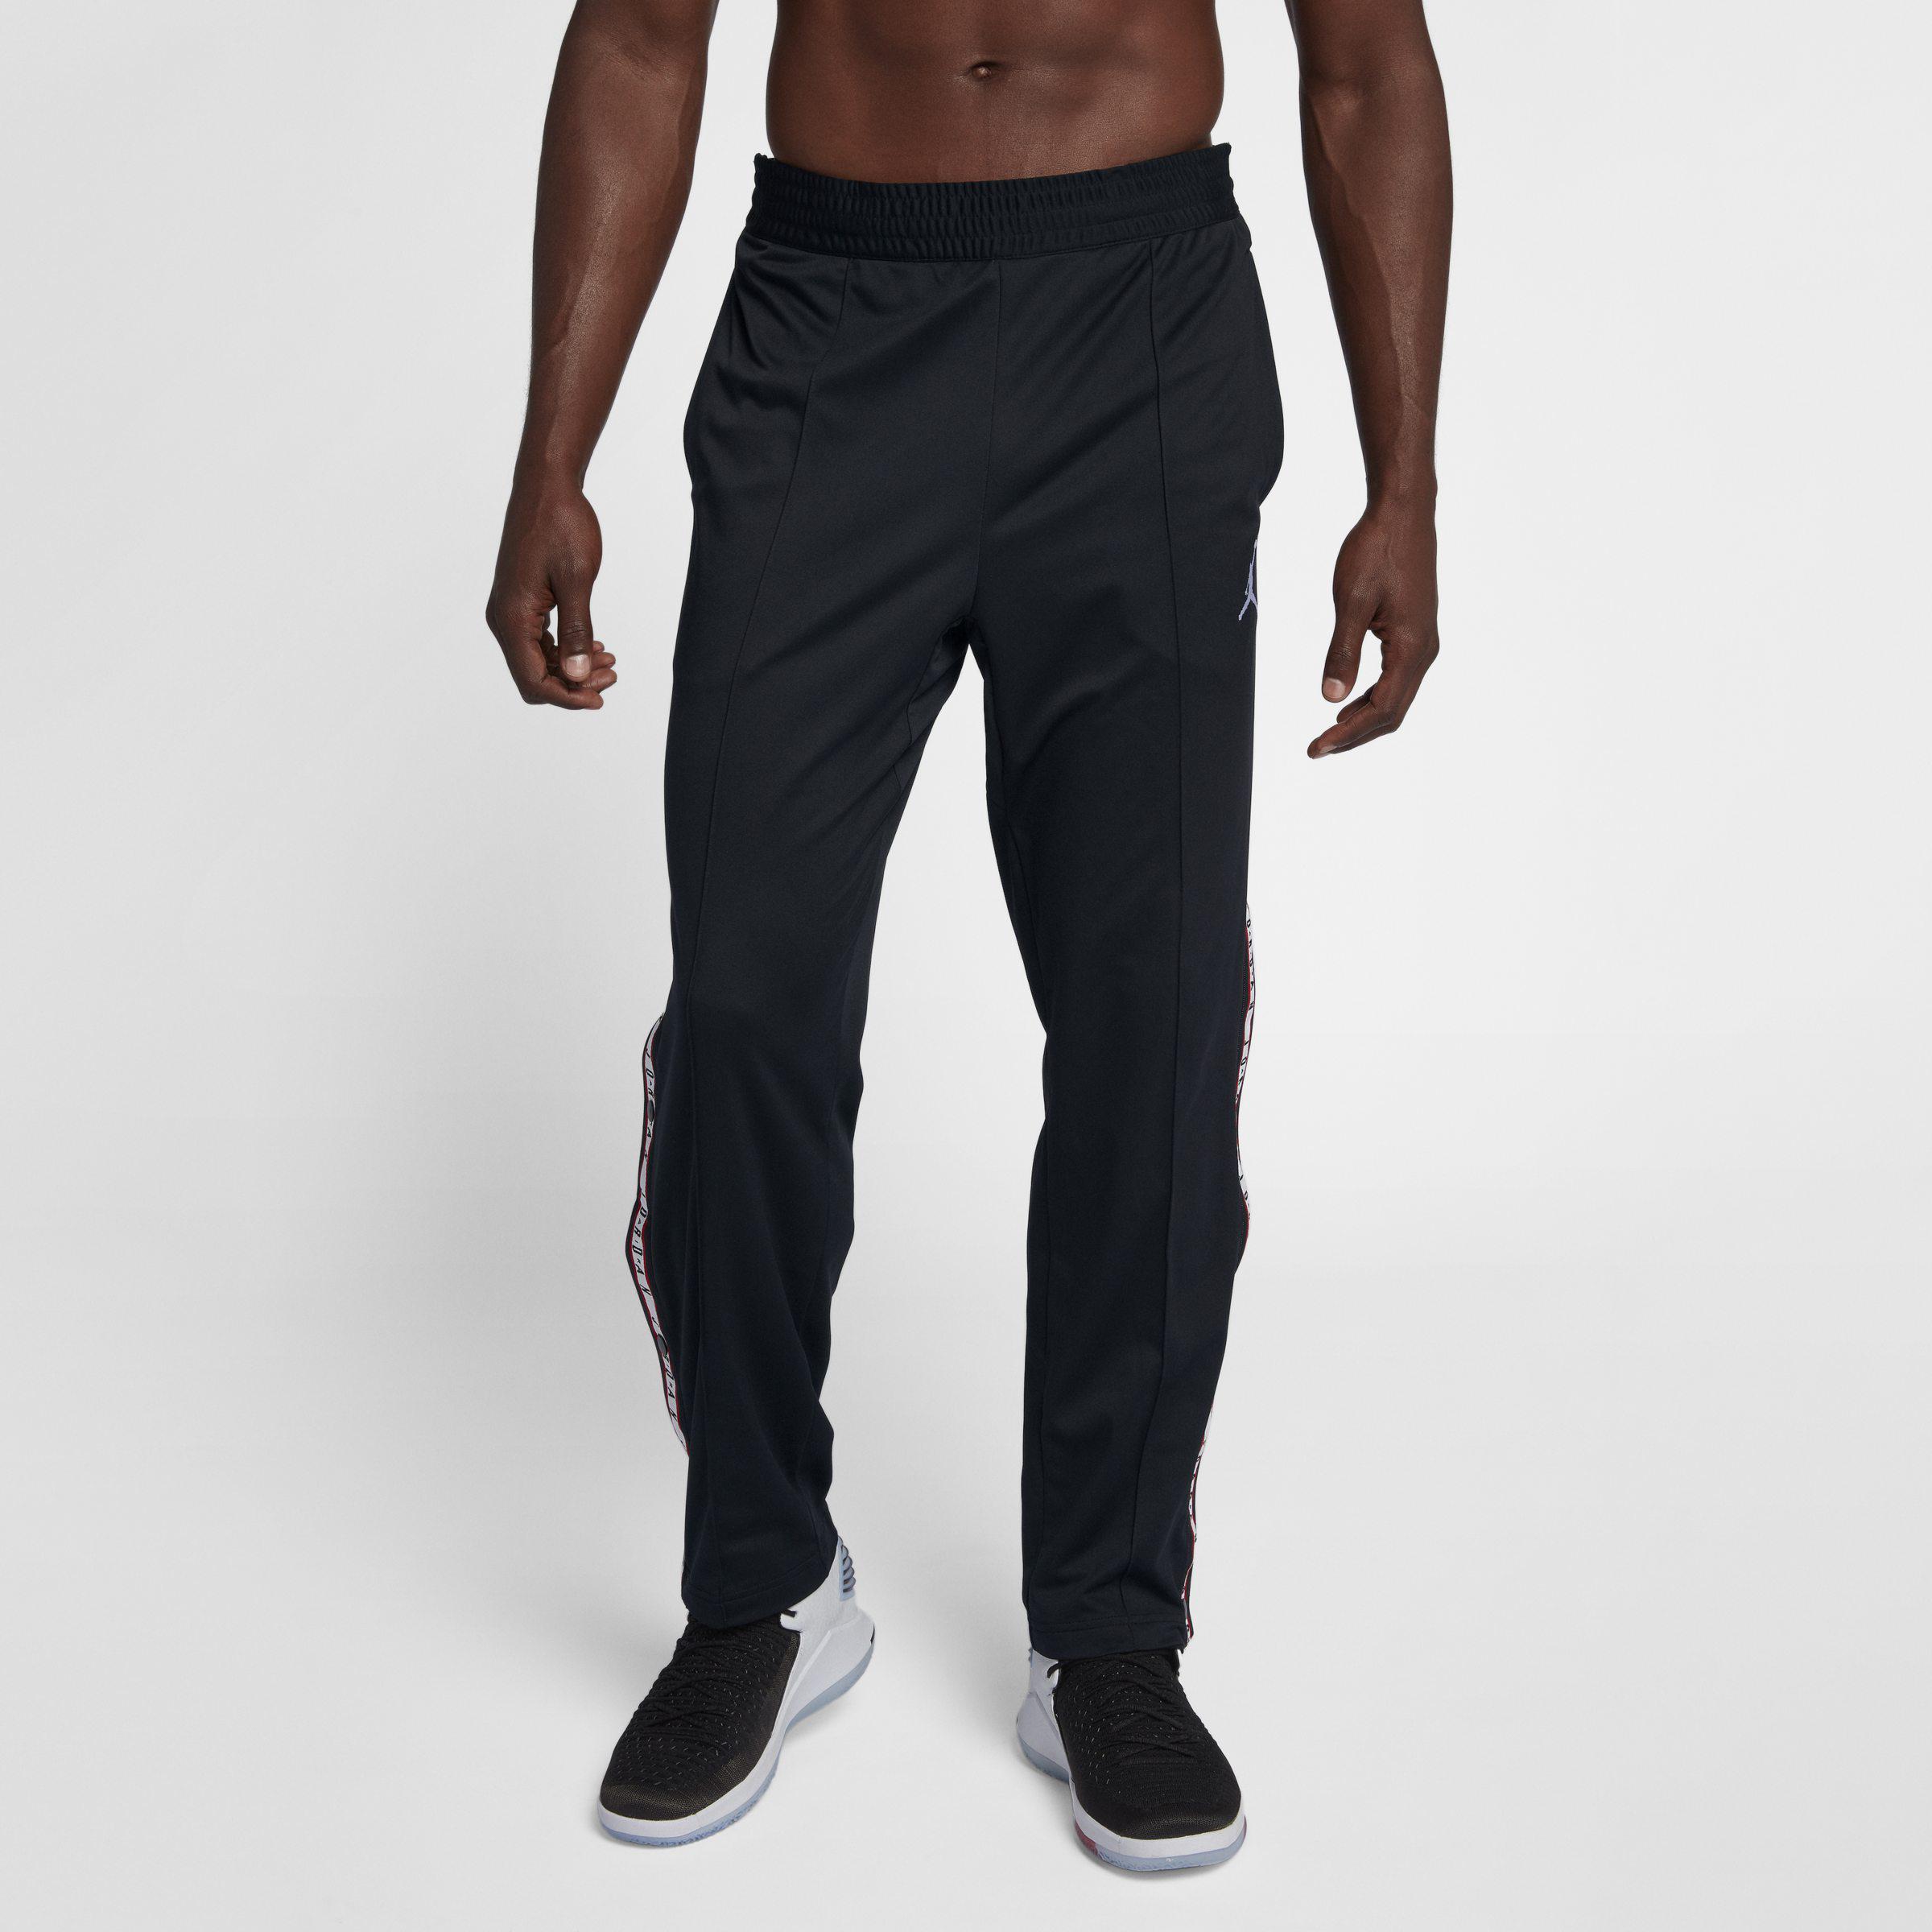 Nike Air Men's Basketball Pants, By Nike in Black for Men Lyst